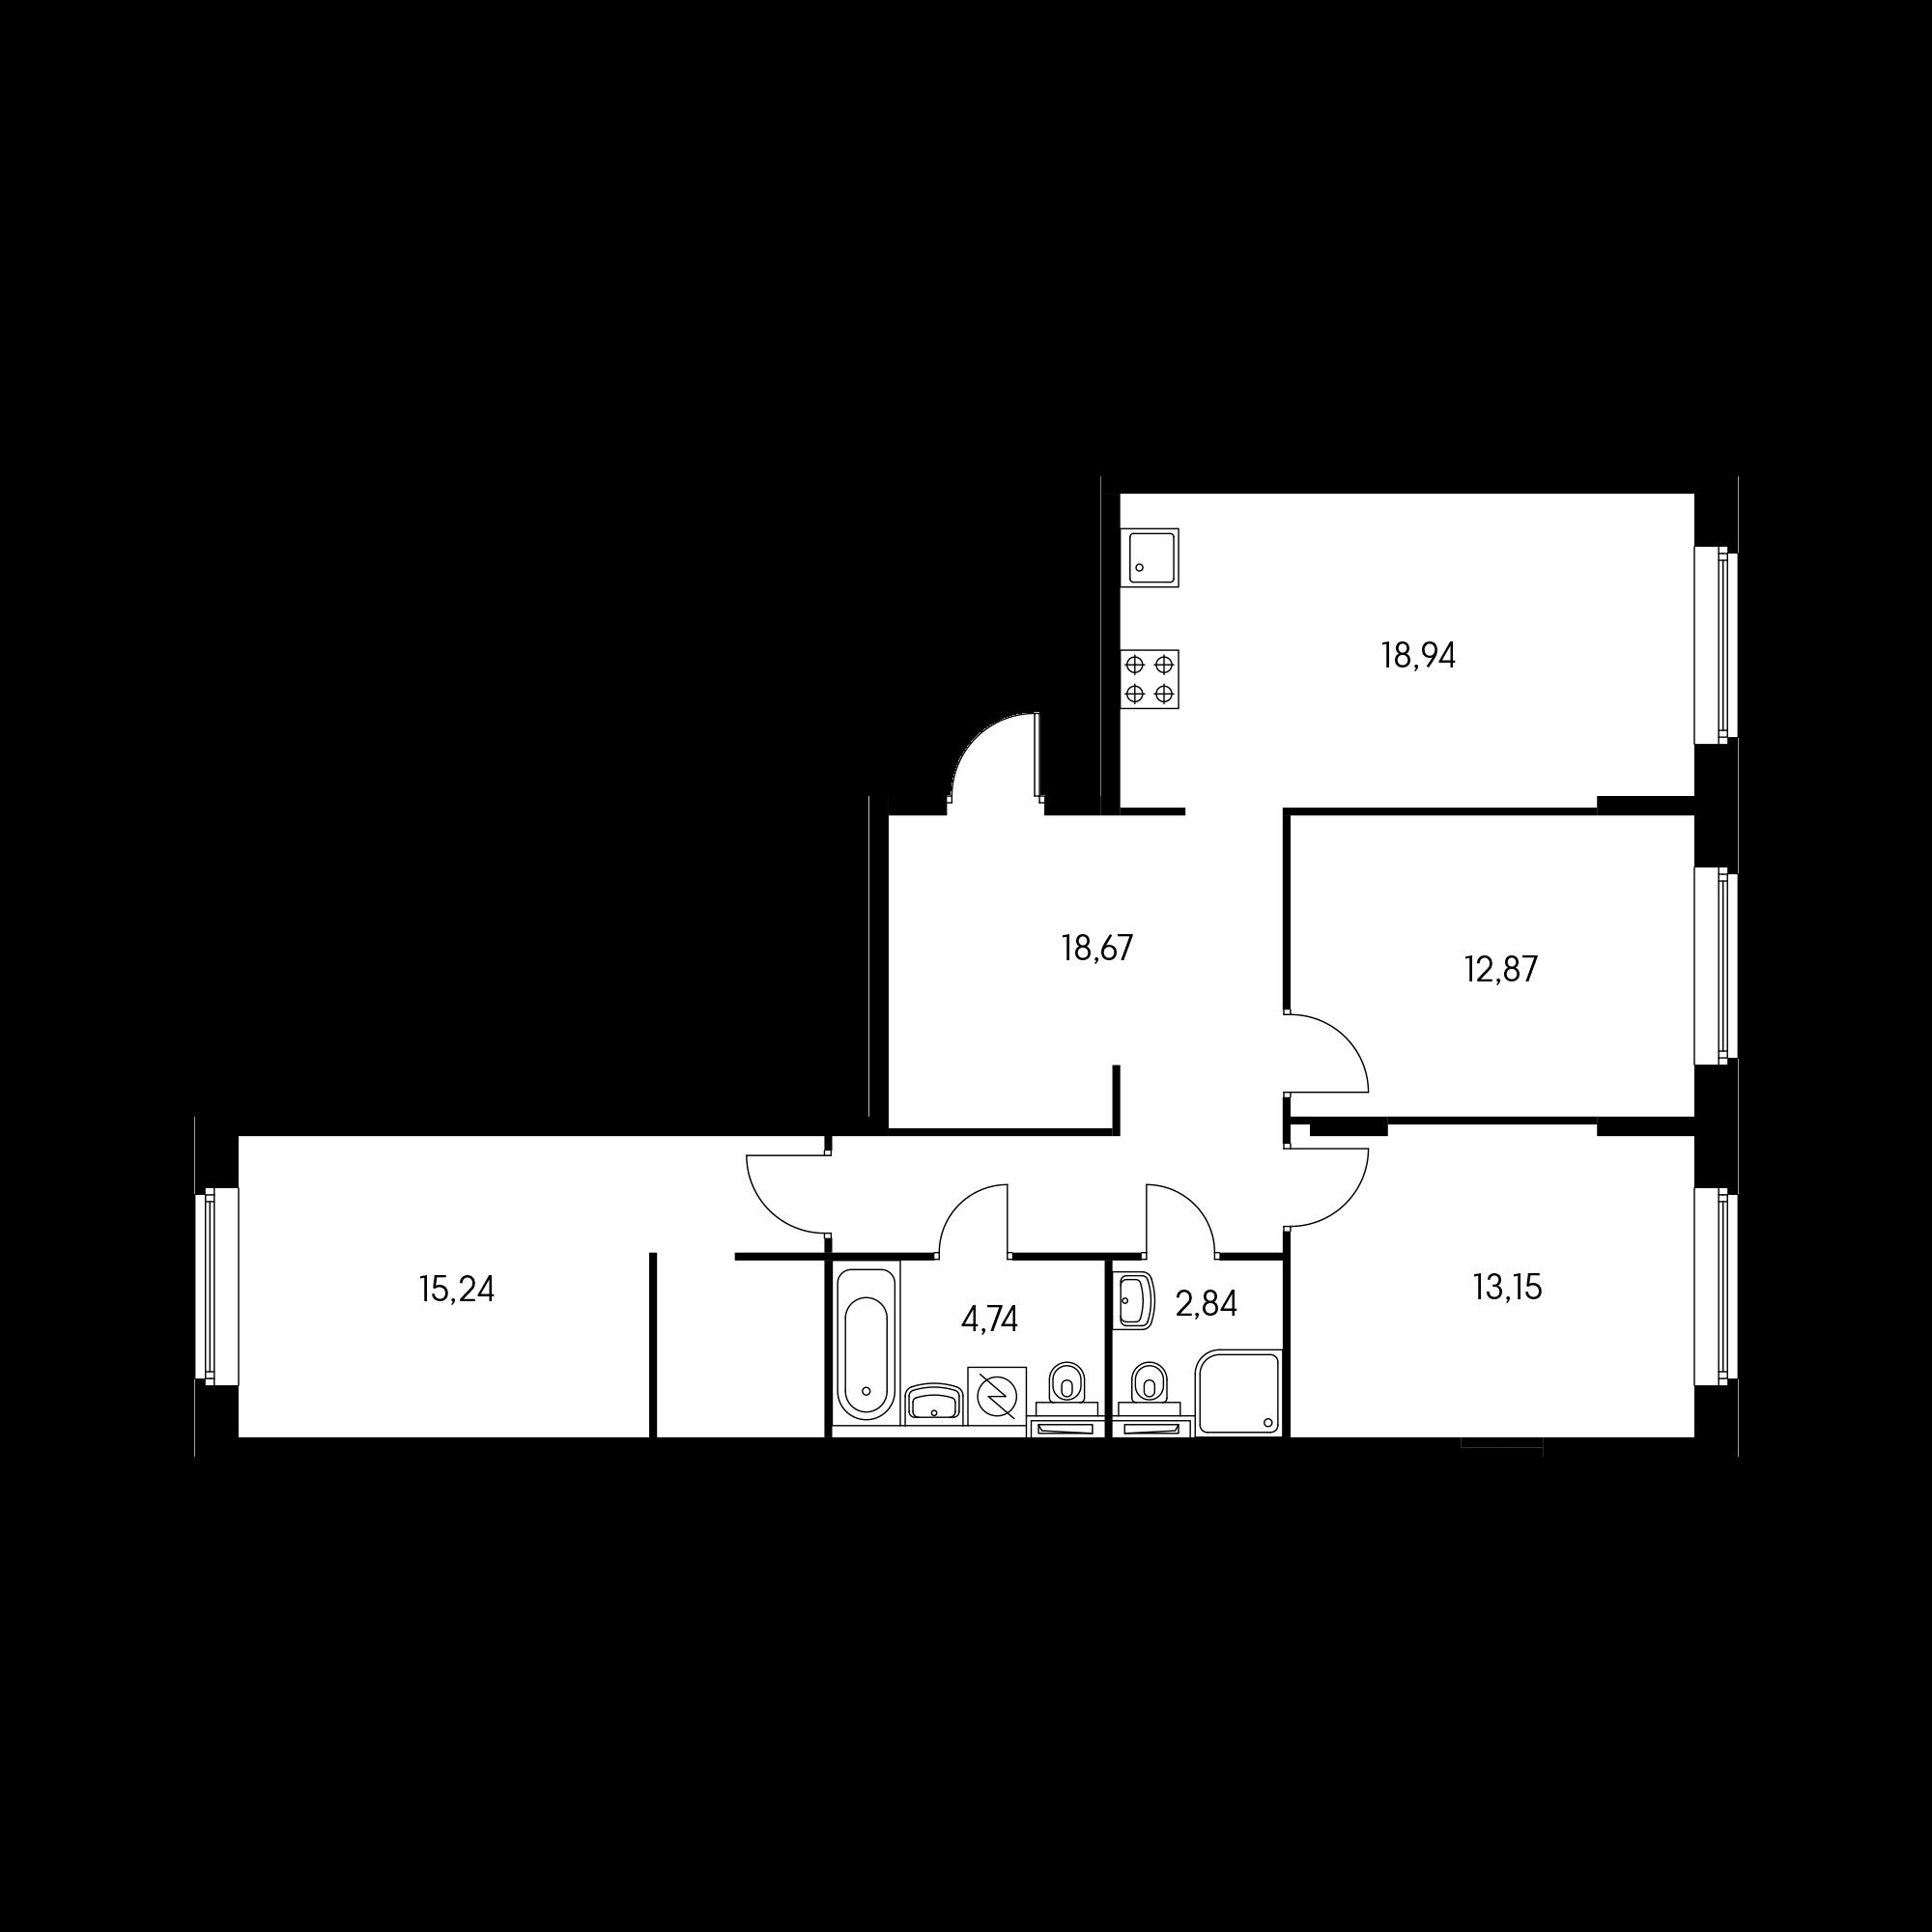 3EL39.9-1